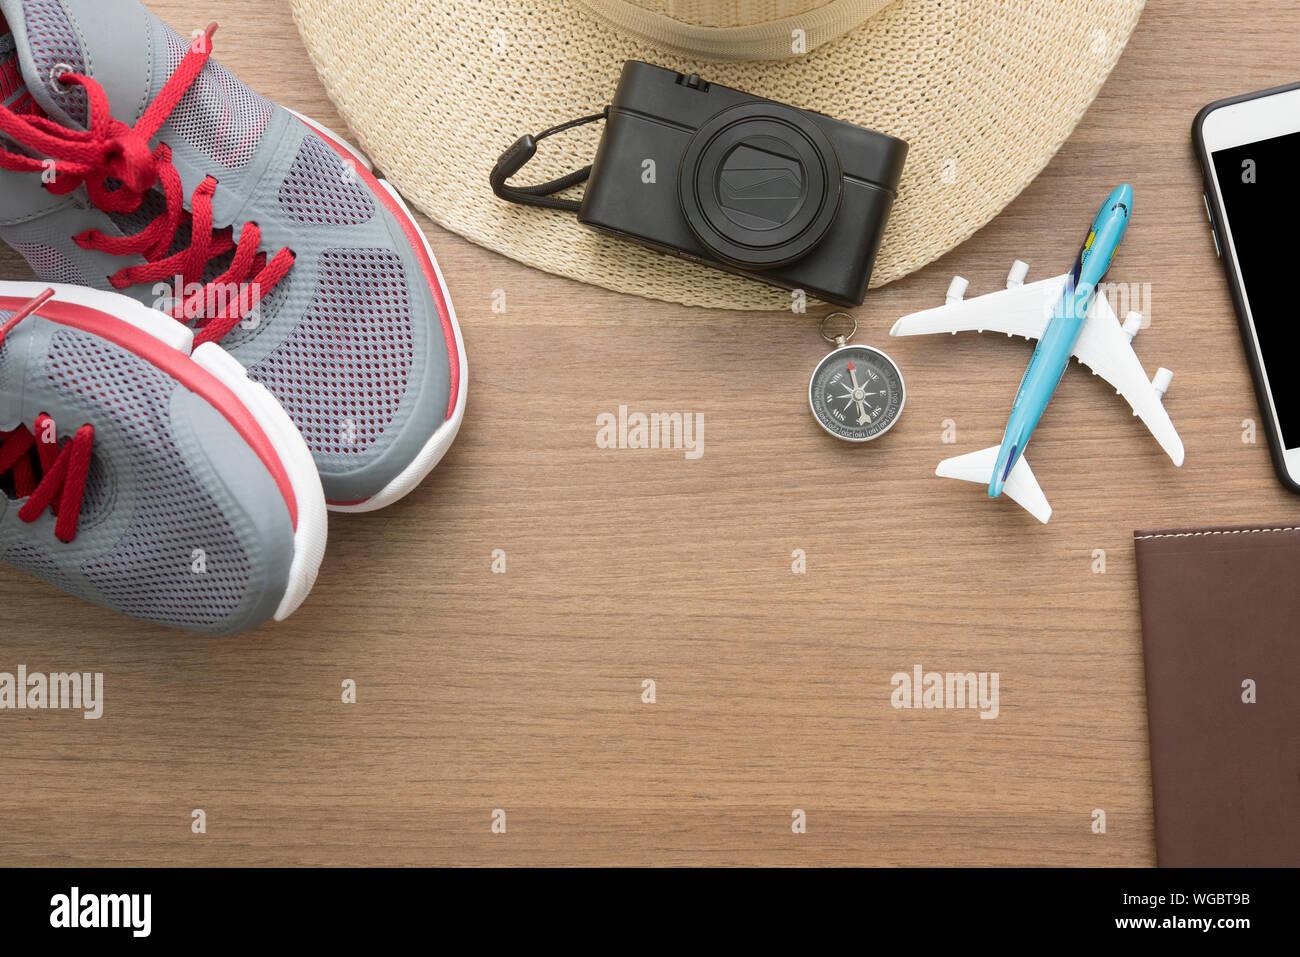 Travel Accessories On Wooden Desk Background With Passport